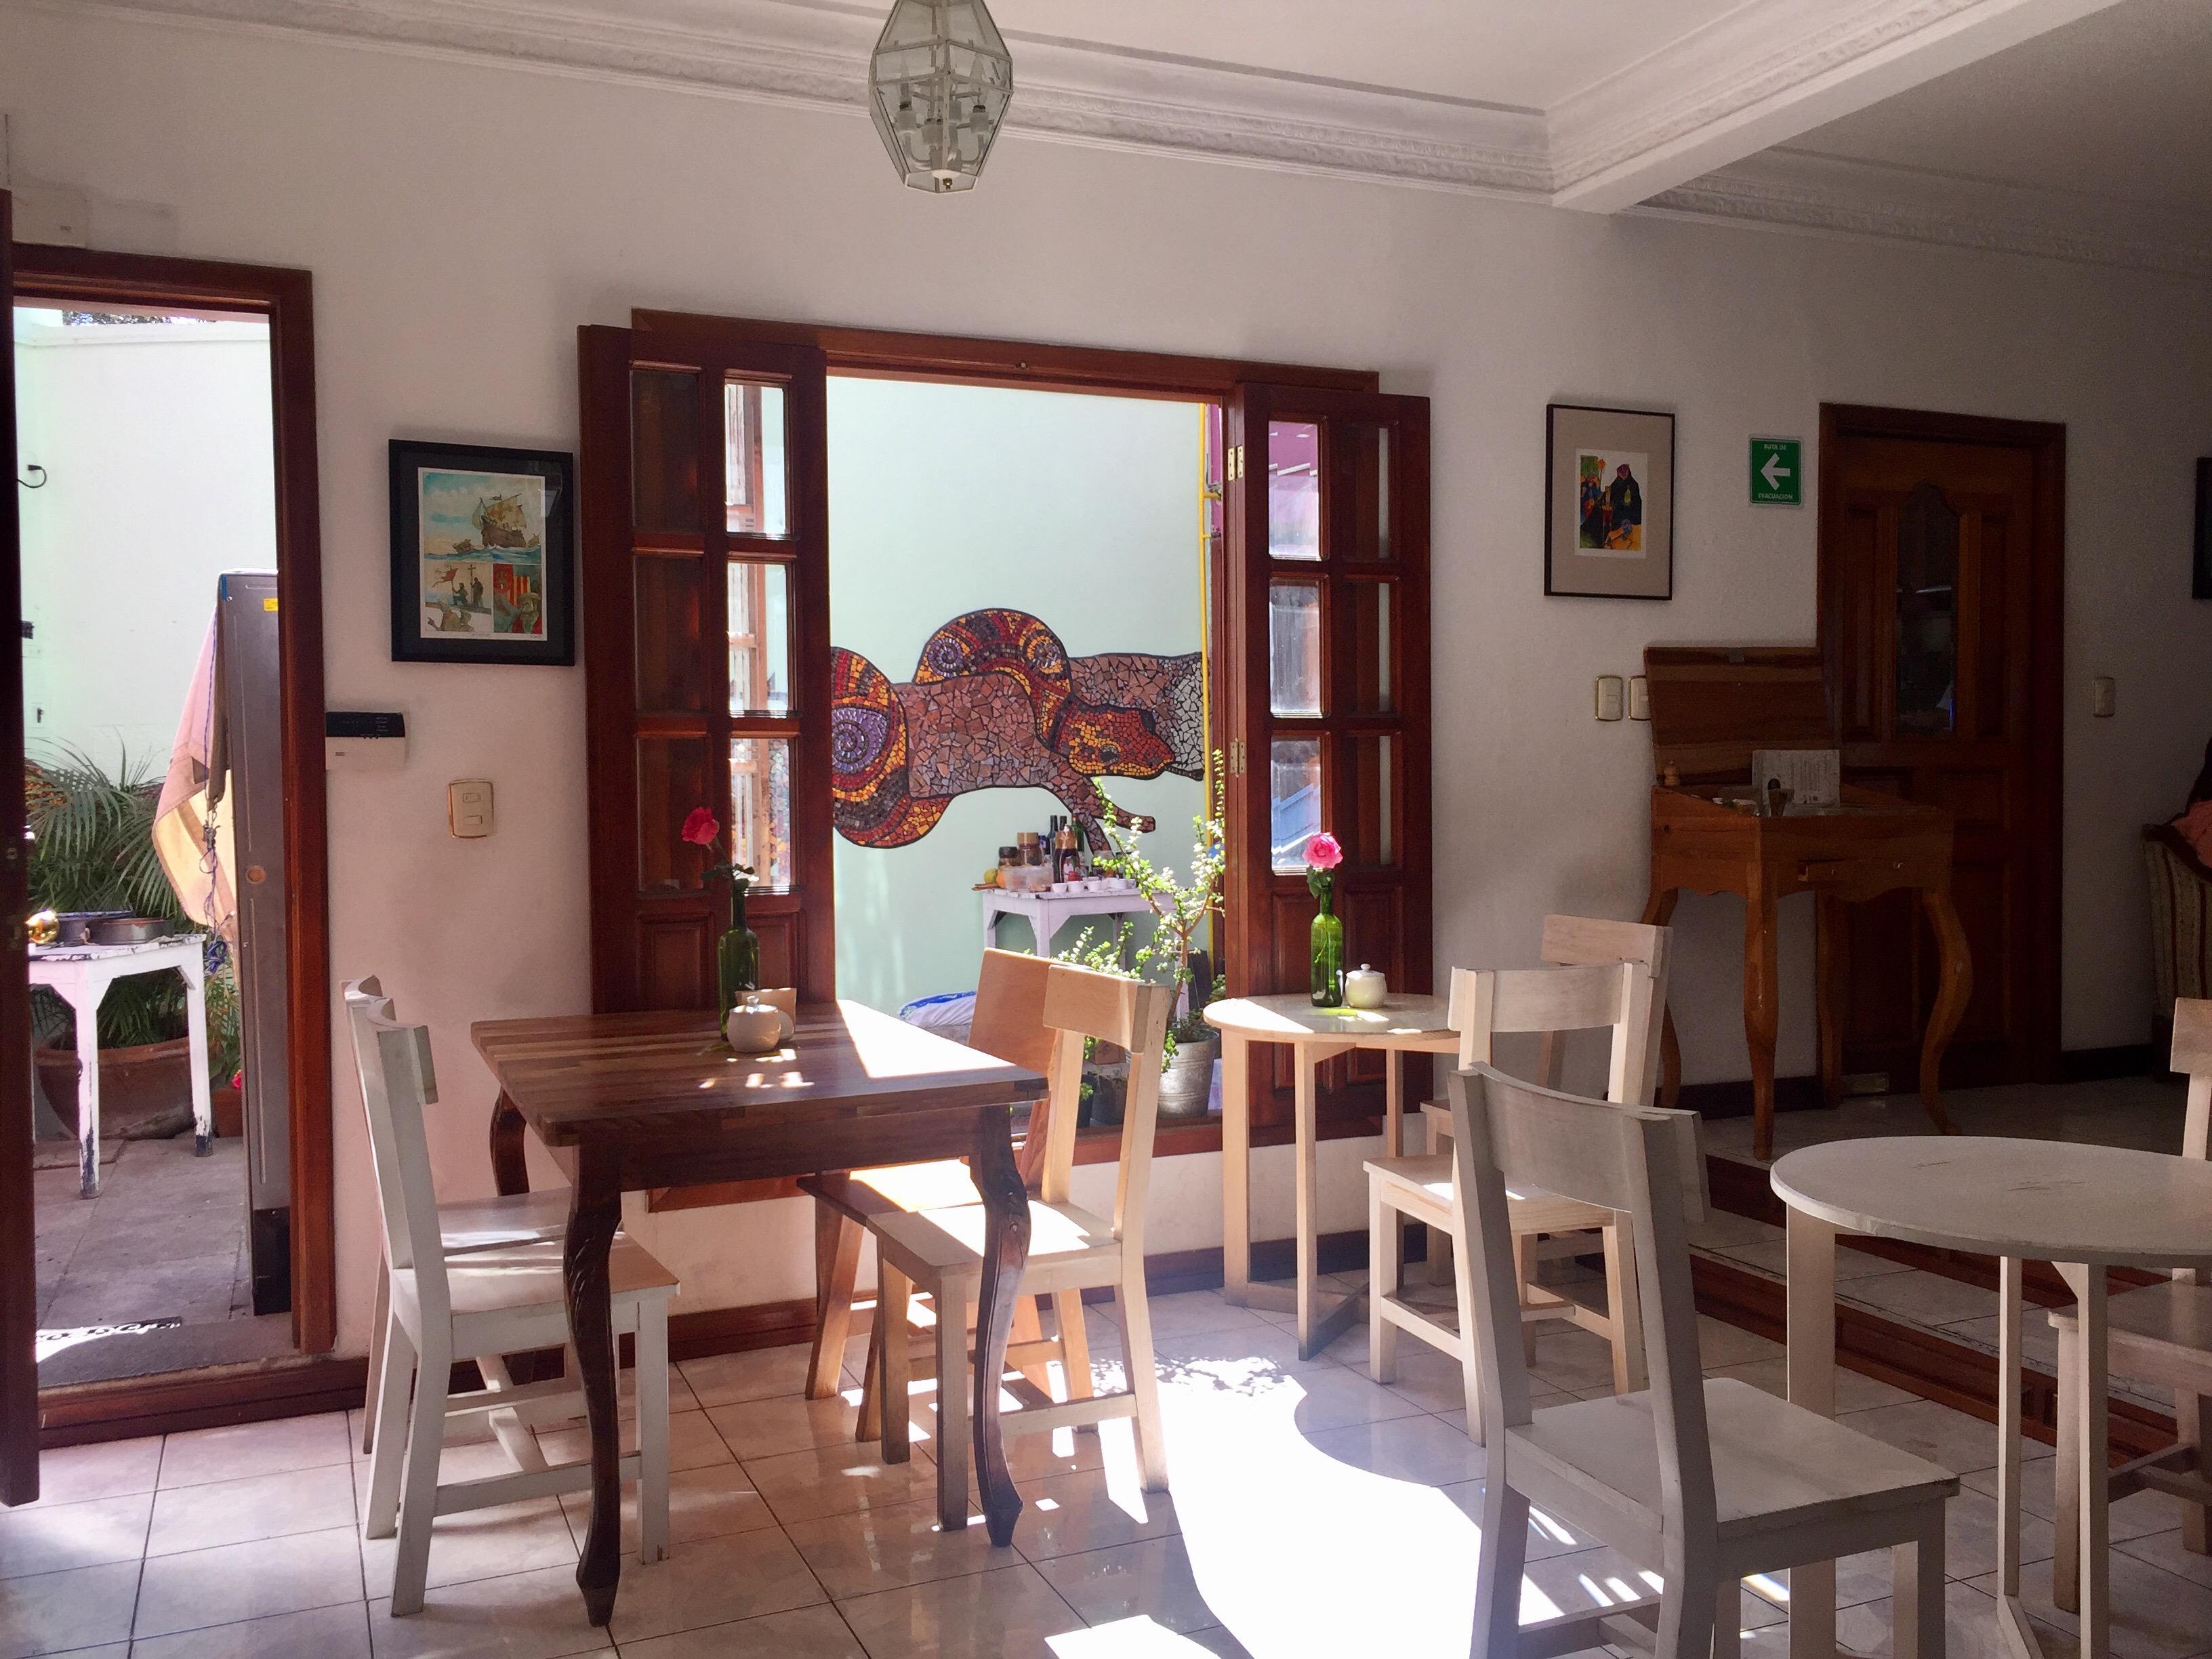 A.M. Cafe, Oaxaca